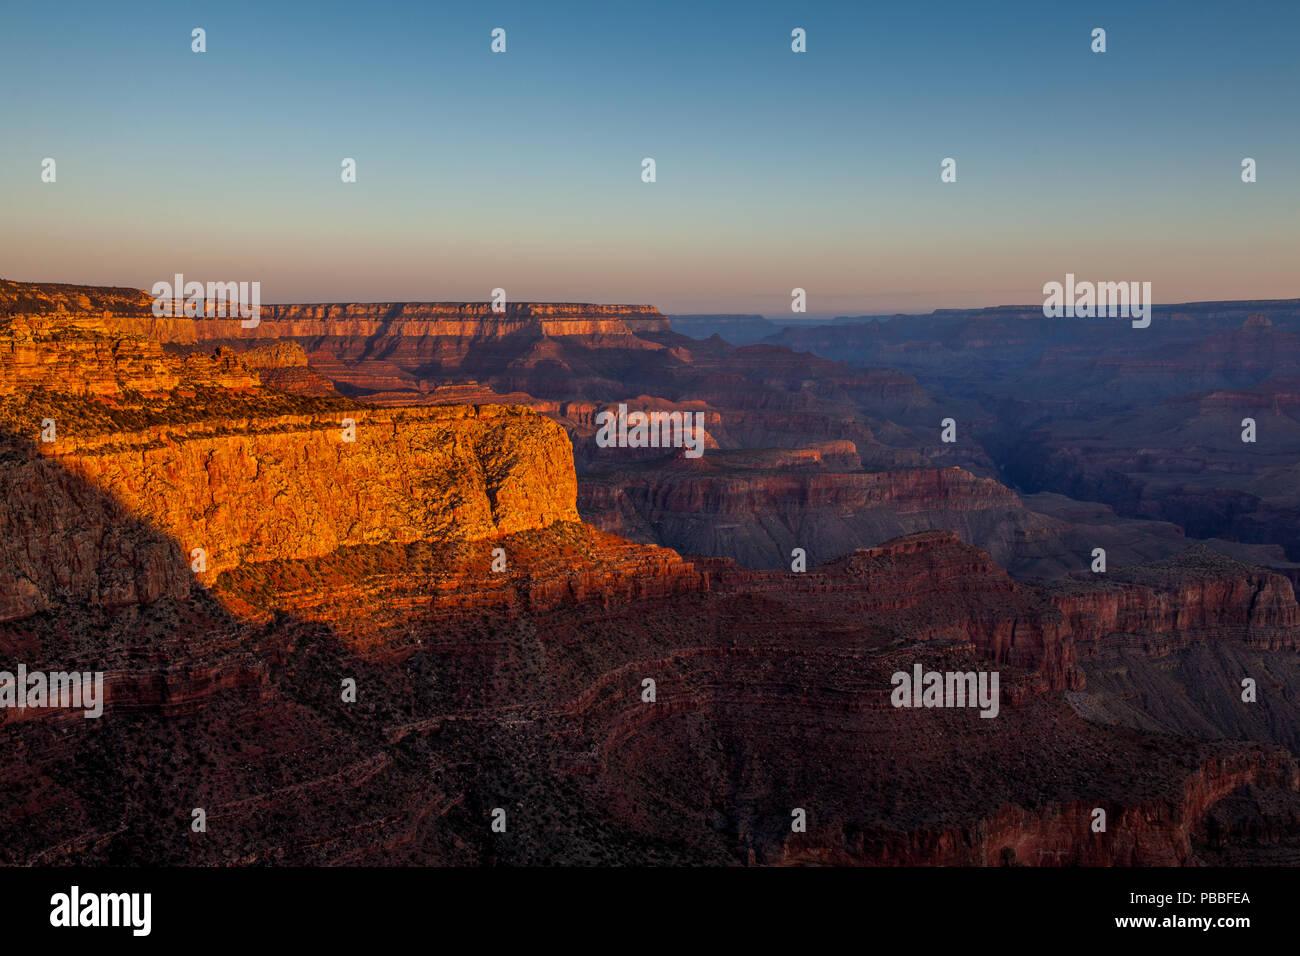 Sunrise @ Moran Point, Grand Canyon NP - Stock Image